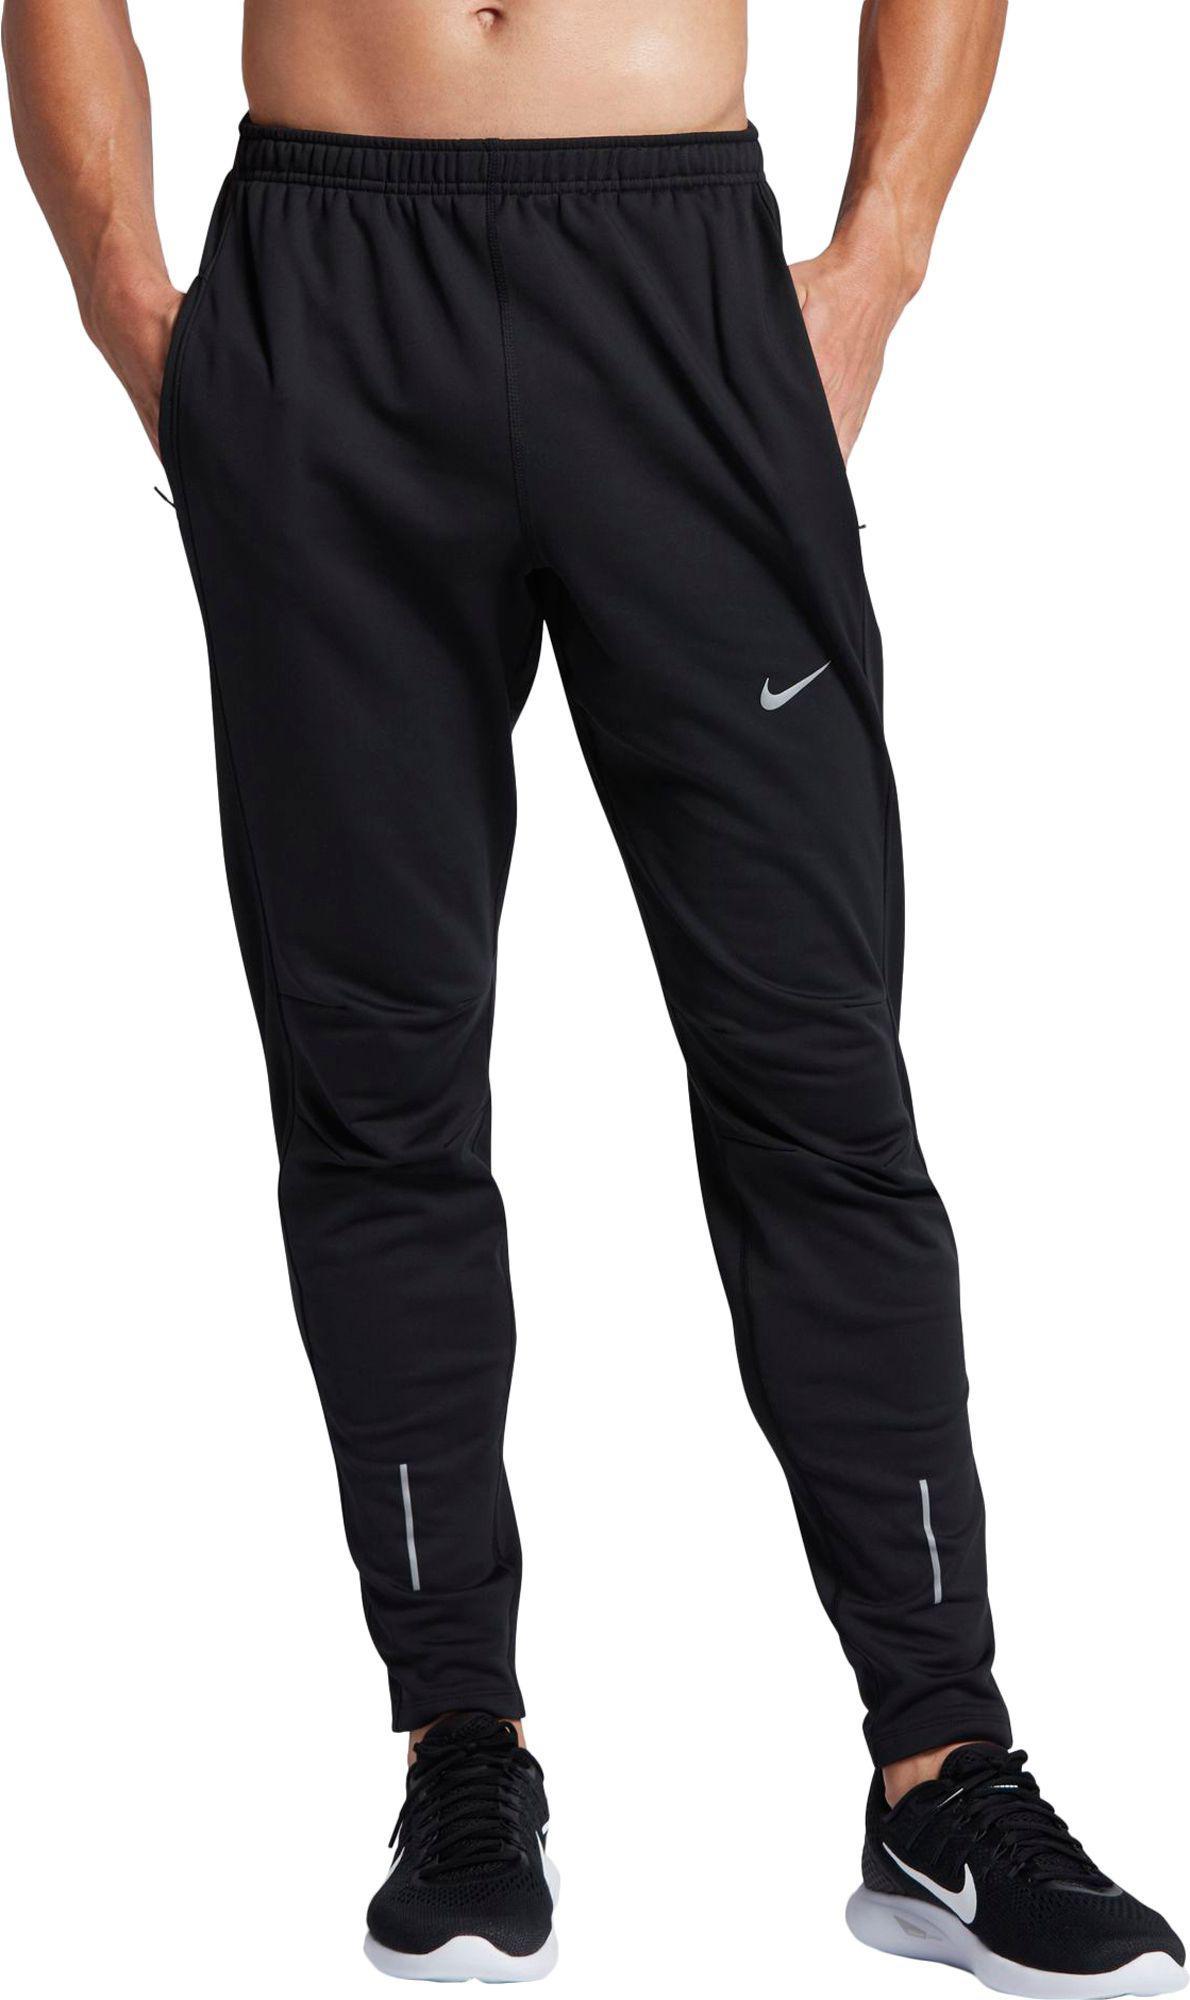 6ac25f12fb47 Lyst - Nike Dri-fit Thermal Running Pants in Black for Men